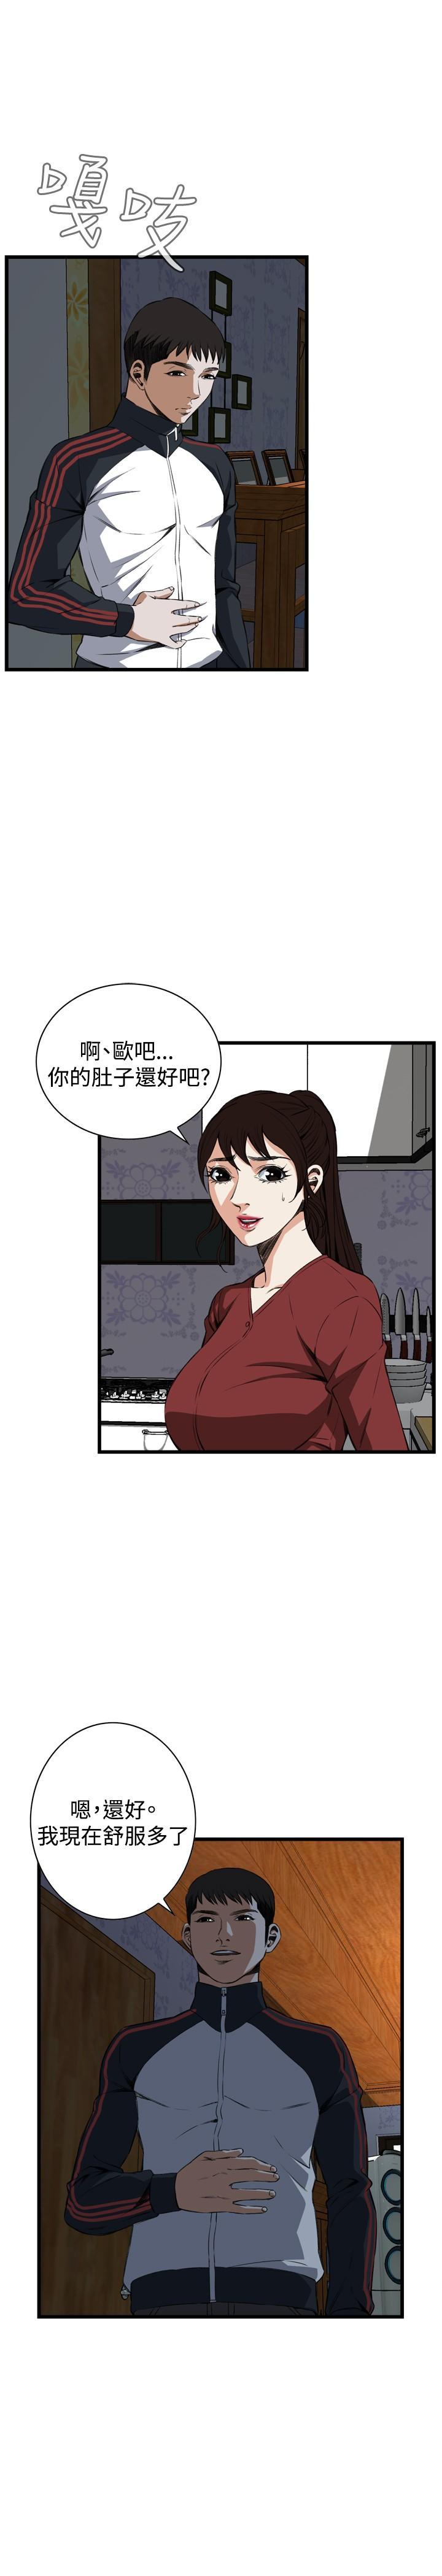 Take a Peek 偷窥 Ch.39~60 [Chinese]中文 598